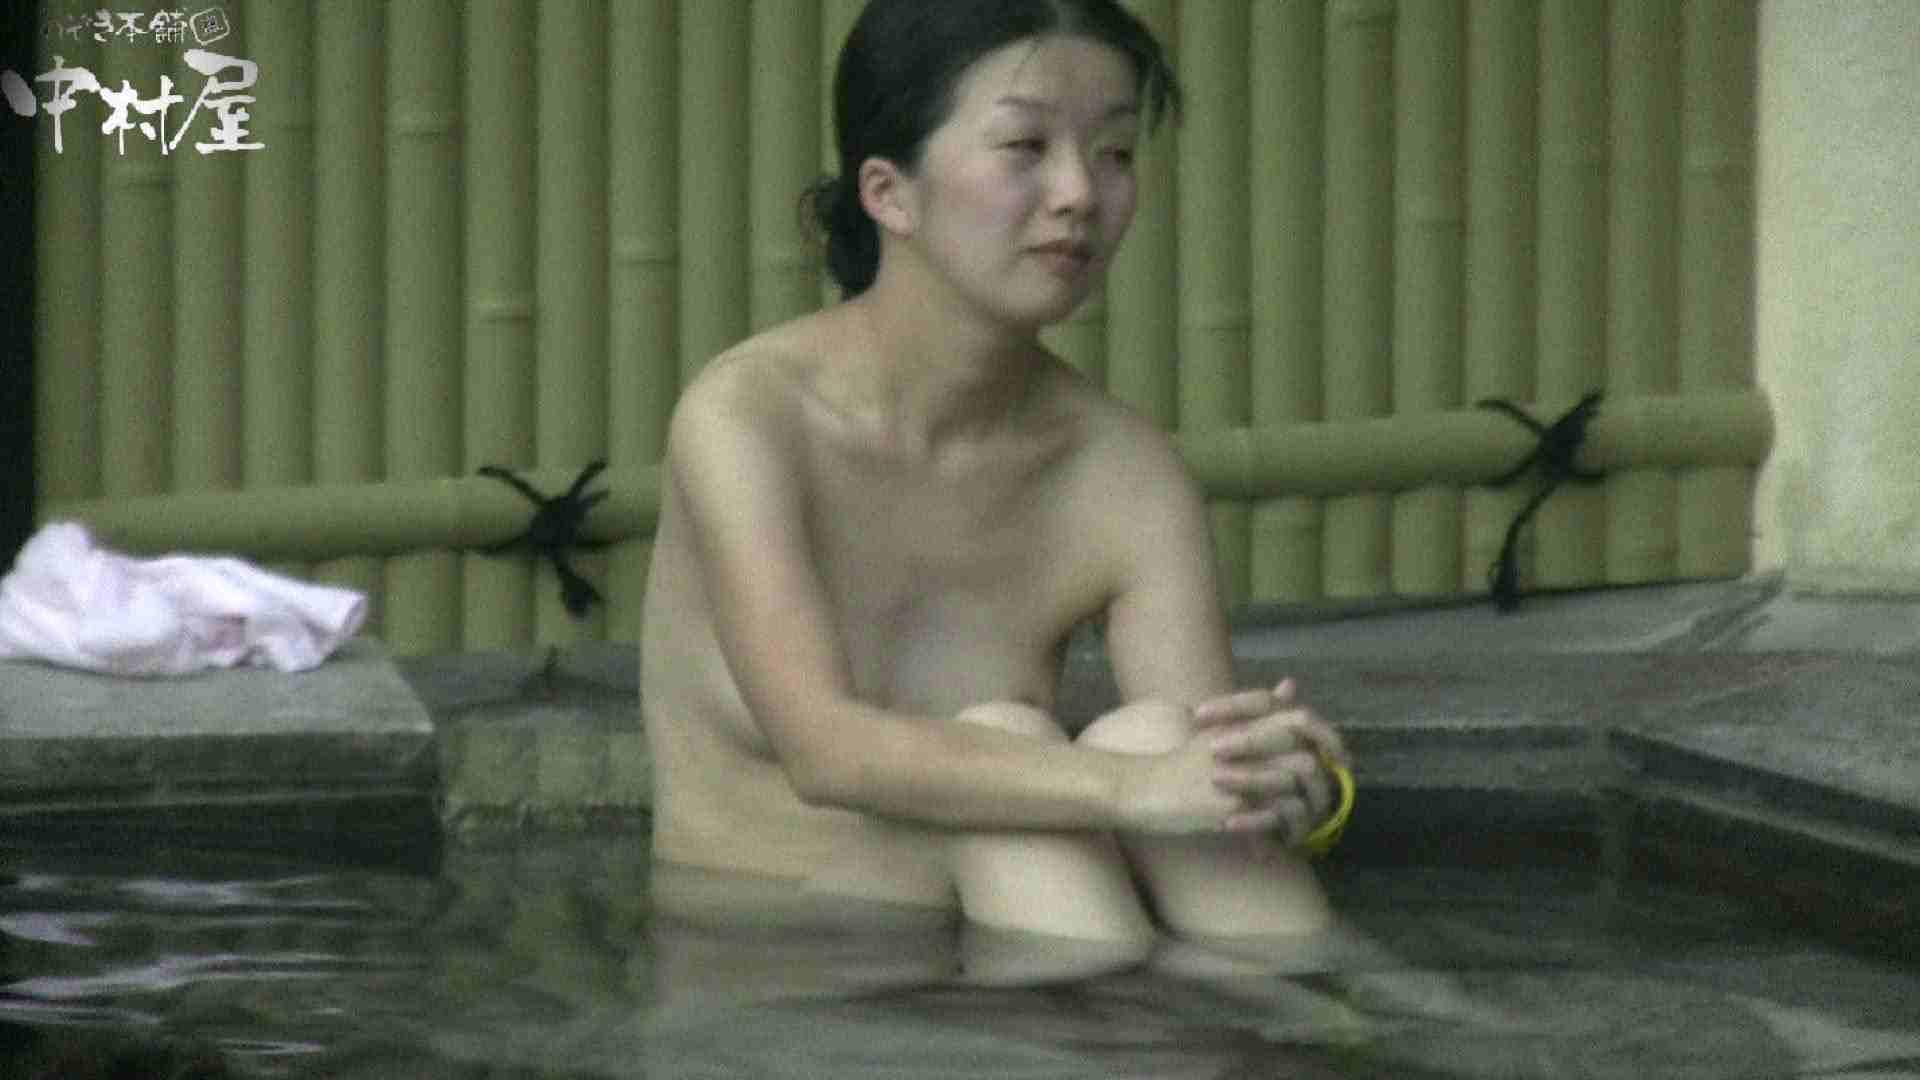 Aquaな露天風呂Vol.904 OL  60連発 46